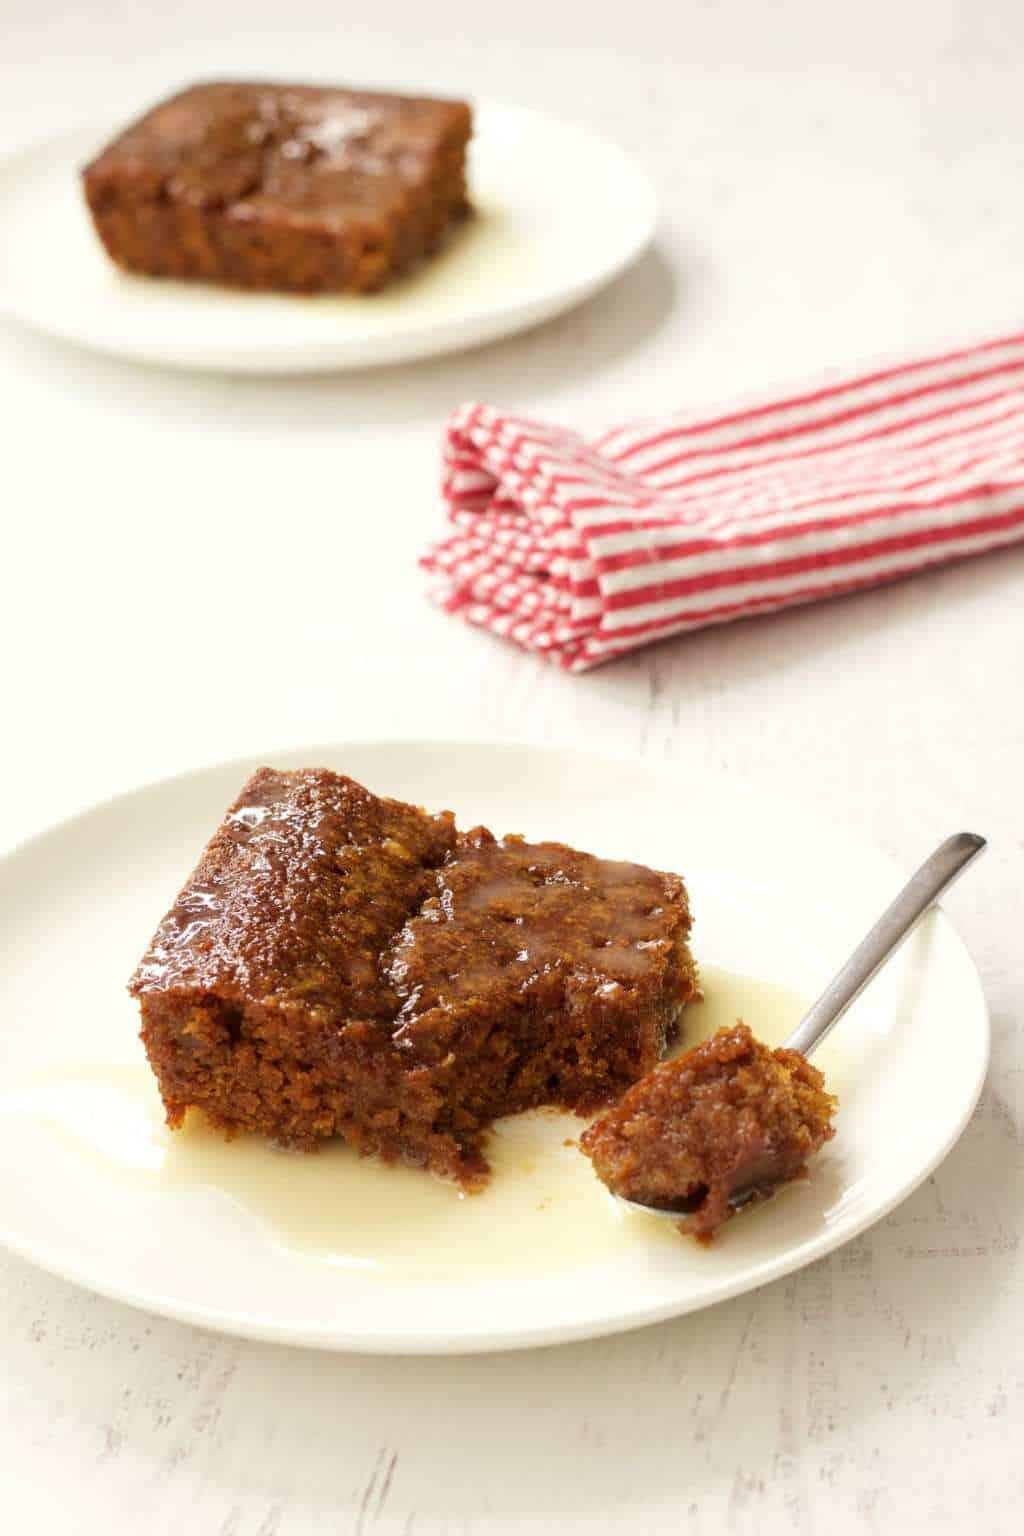 Sticky Vegan Malva Pudding #vegan #dessert #lovingitvegan #malva #pudding